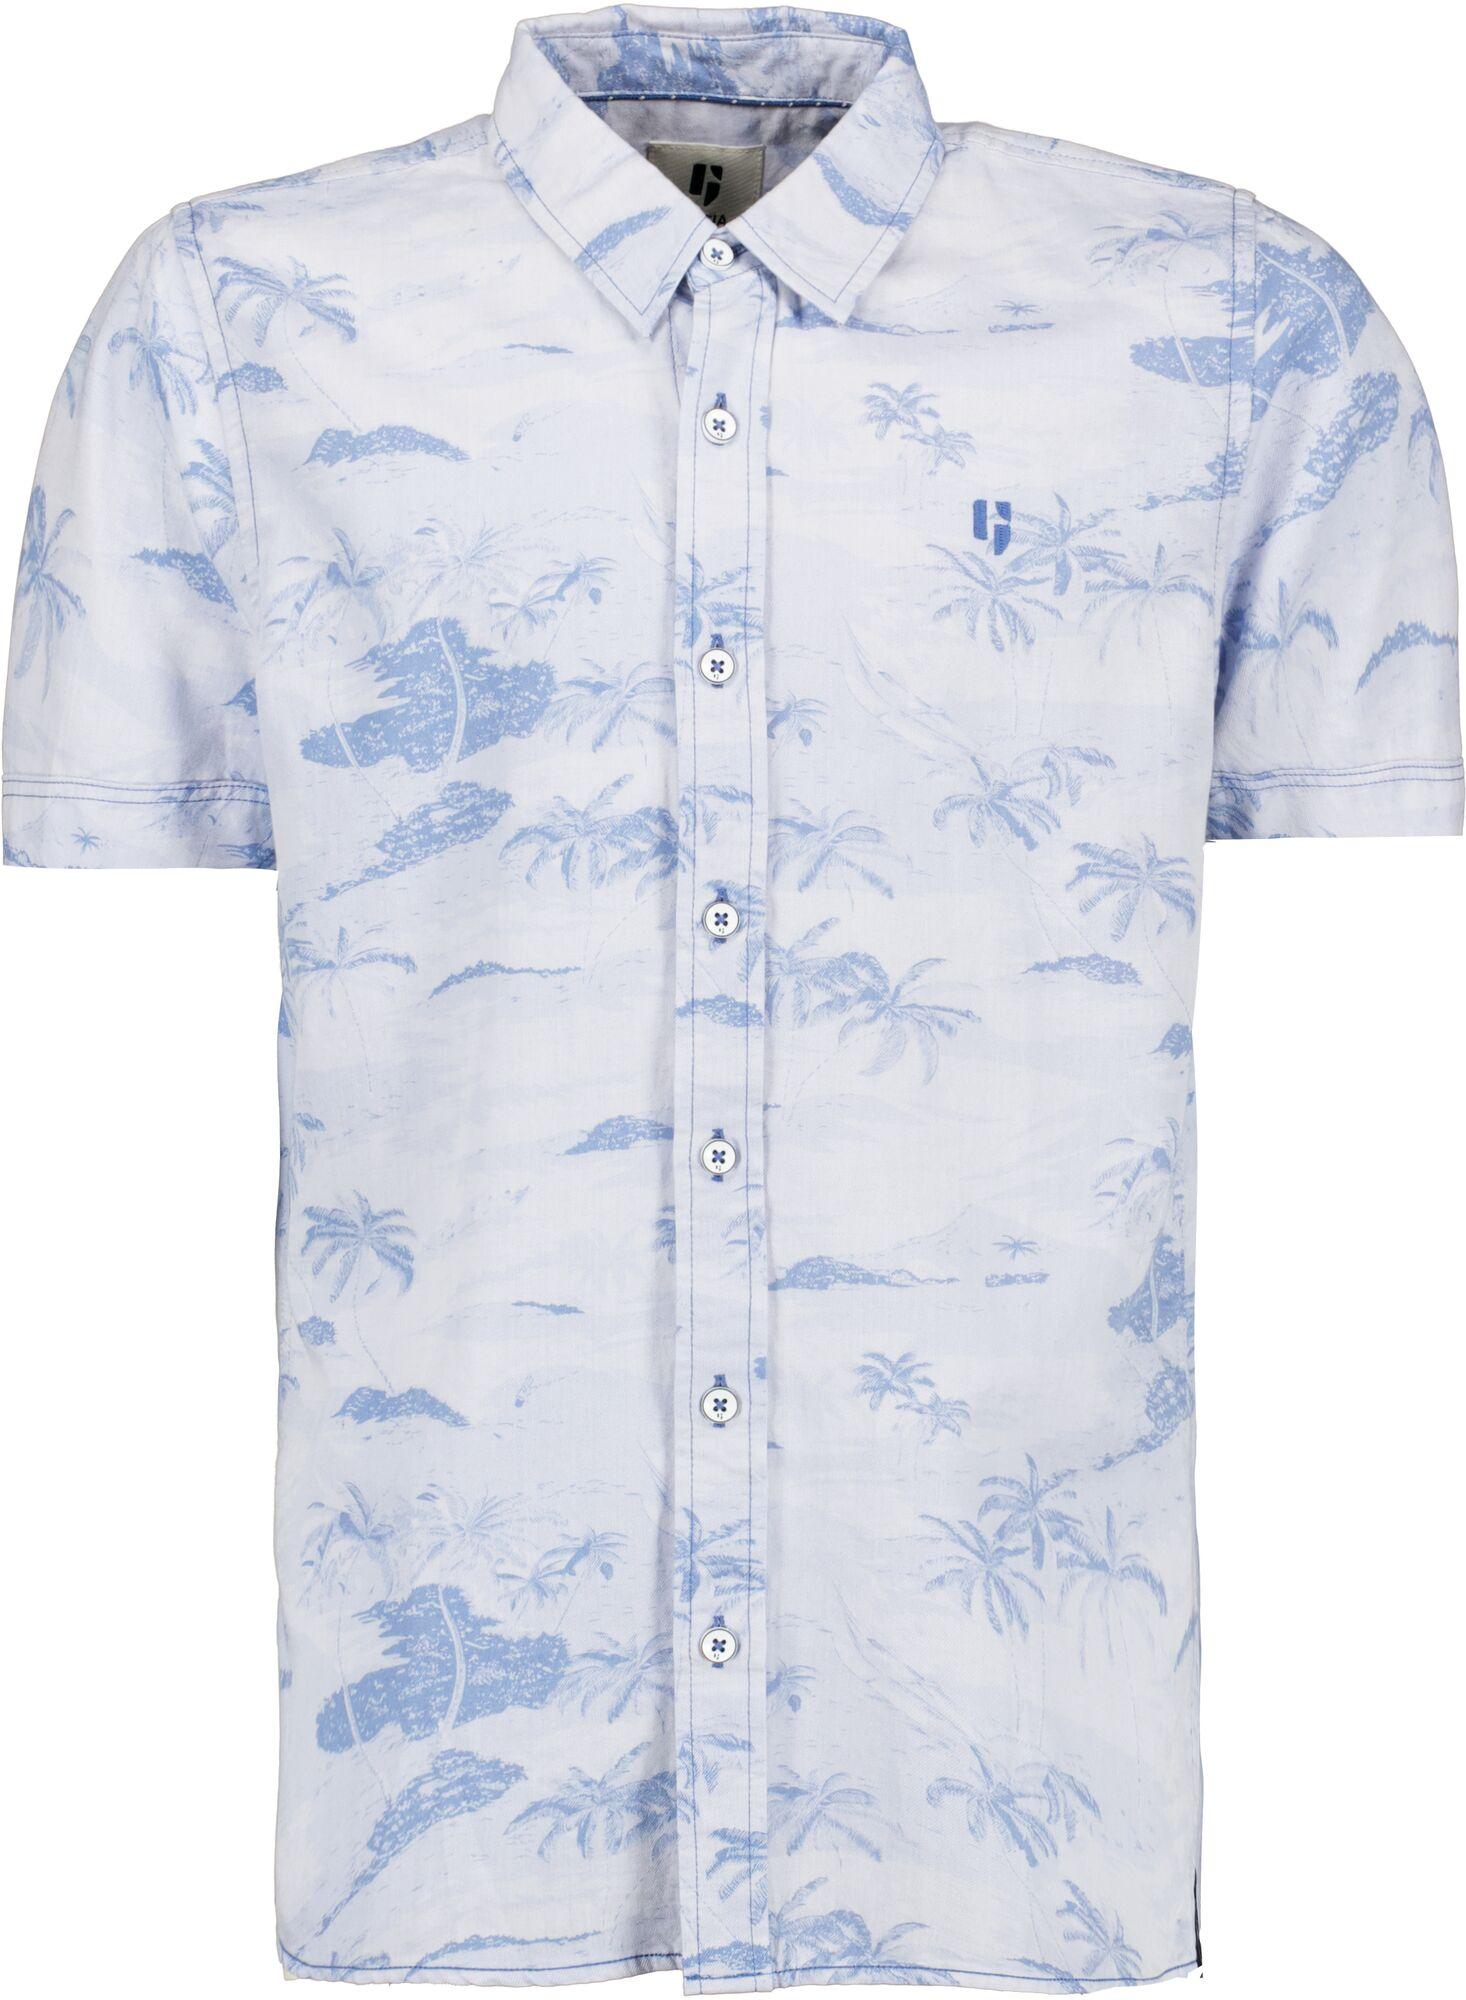 Garcia - Boys-Shirt s. sl.